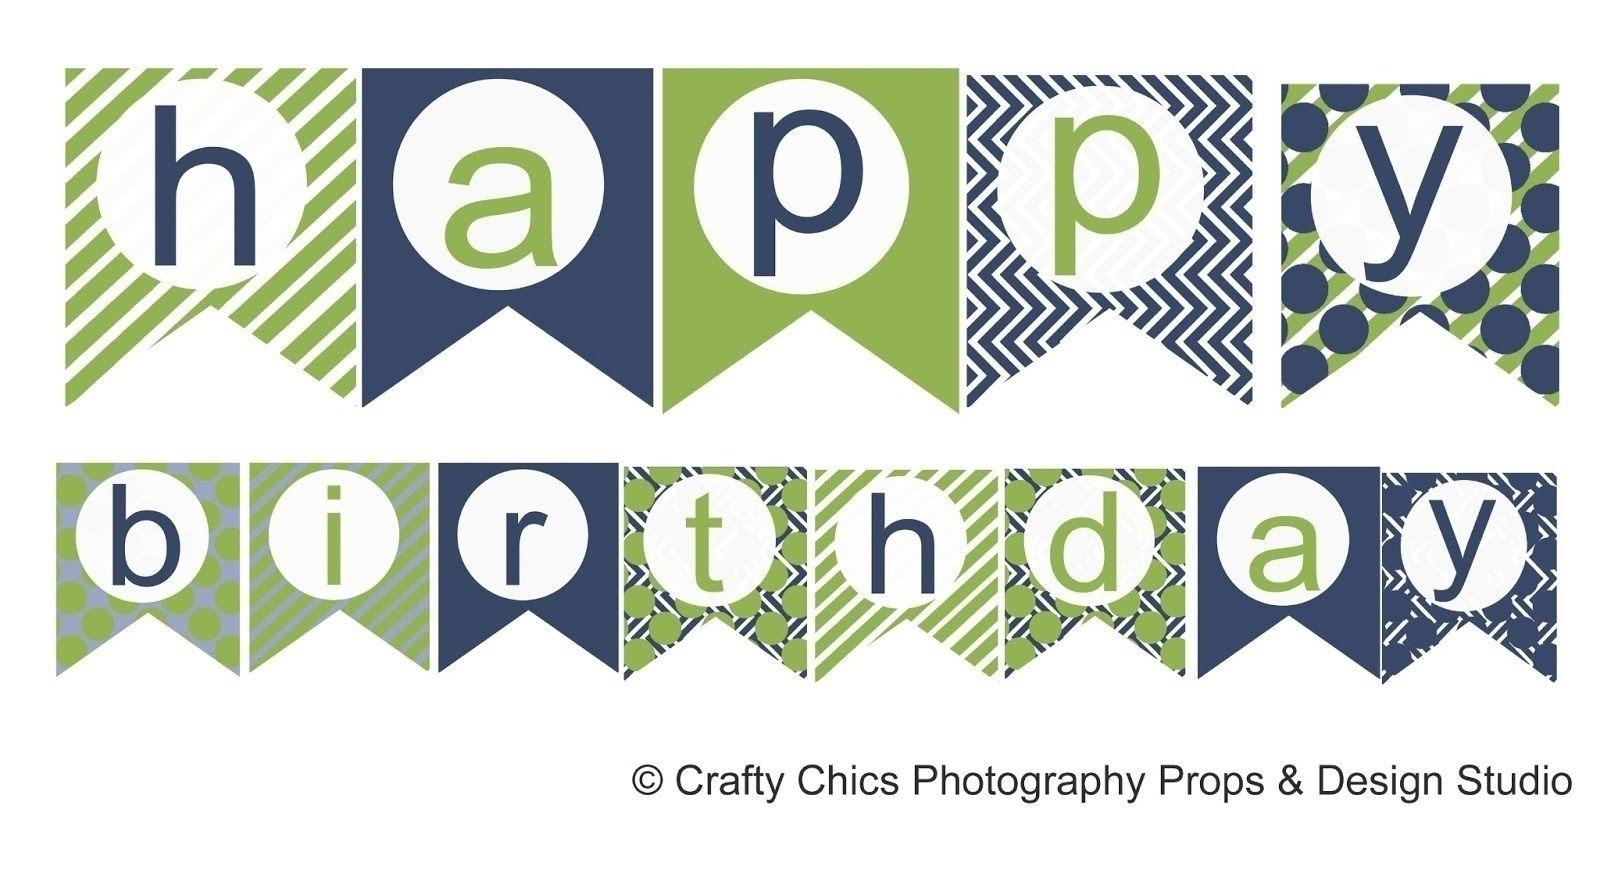 Free Printable Happy Birthday Banner Templates | Bestprintable231118 - Birthday Banner Templates Free Printable